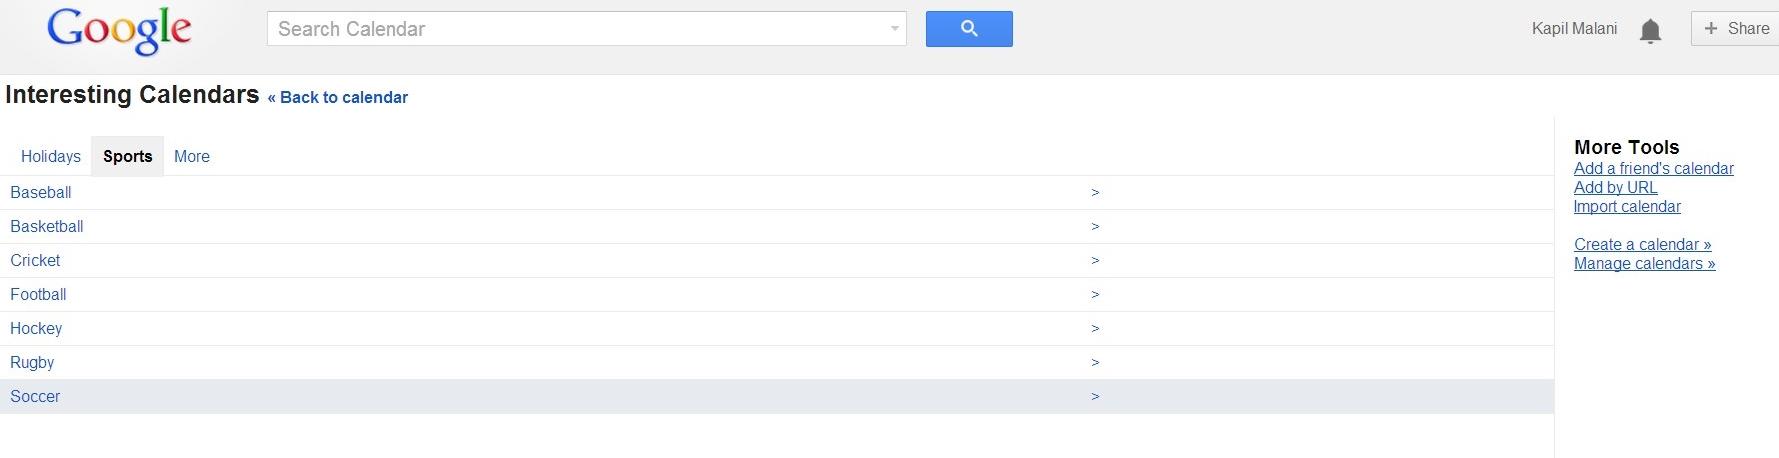 Add Public Calendar to Google Calendar